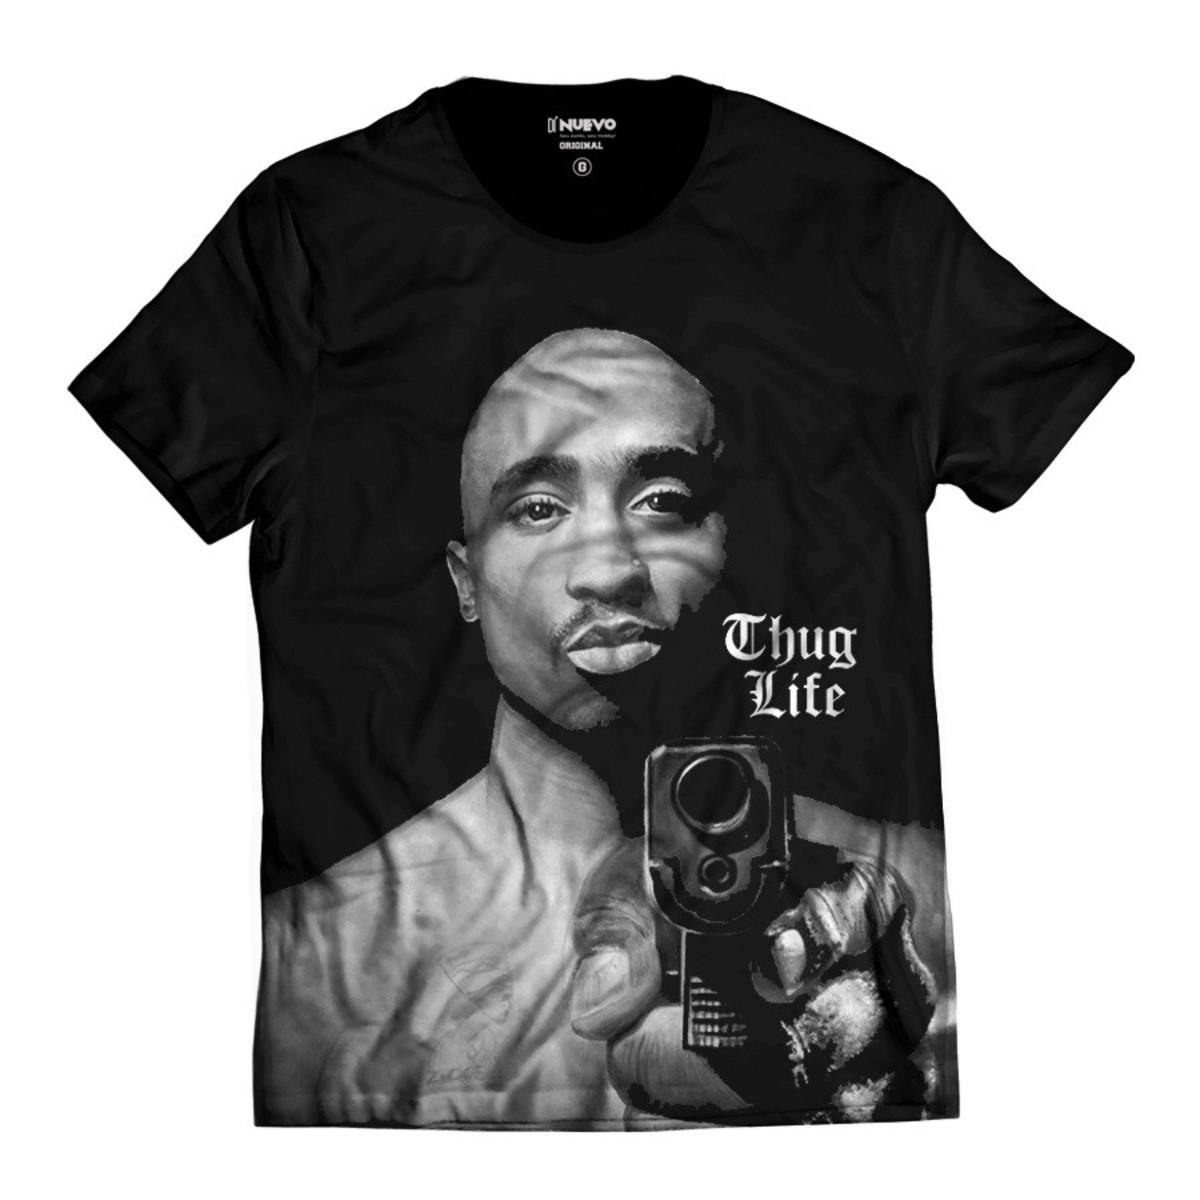 f52f1d484a023 Camiseta Tupac Shakur Gangster Thug Life Hip Hop 2Pac no Elo7